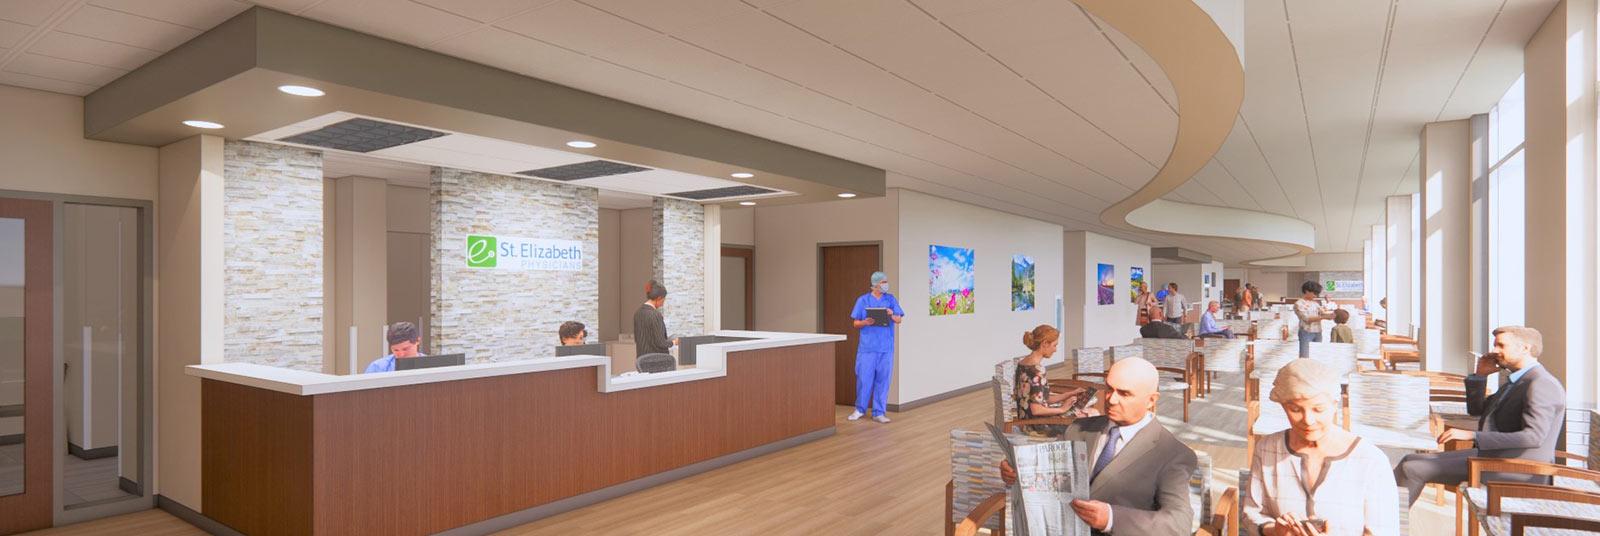 St. Elizabeth Fort Thomas medical office building renderings showing lobby space.